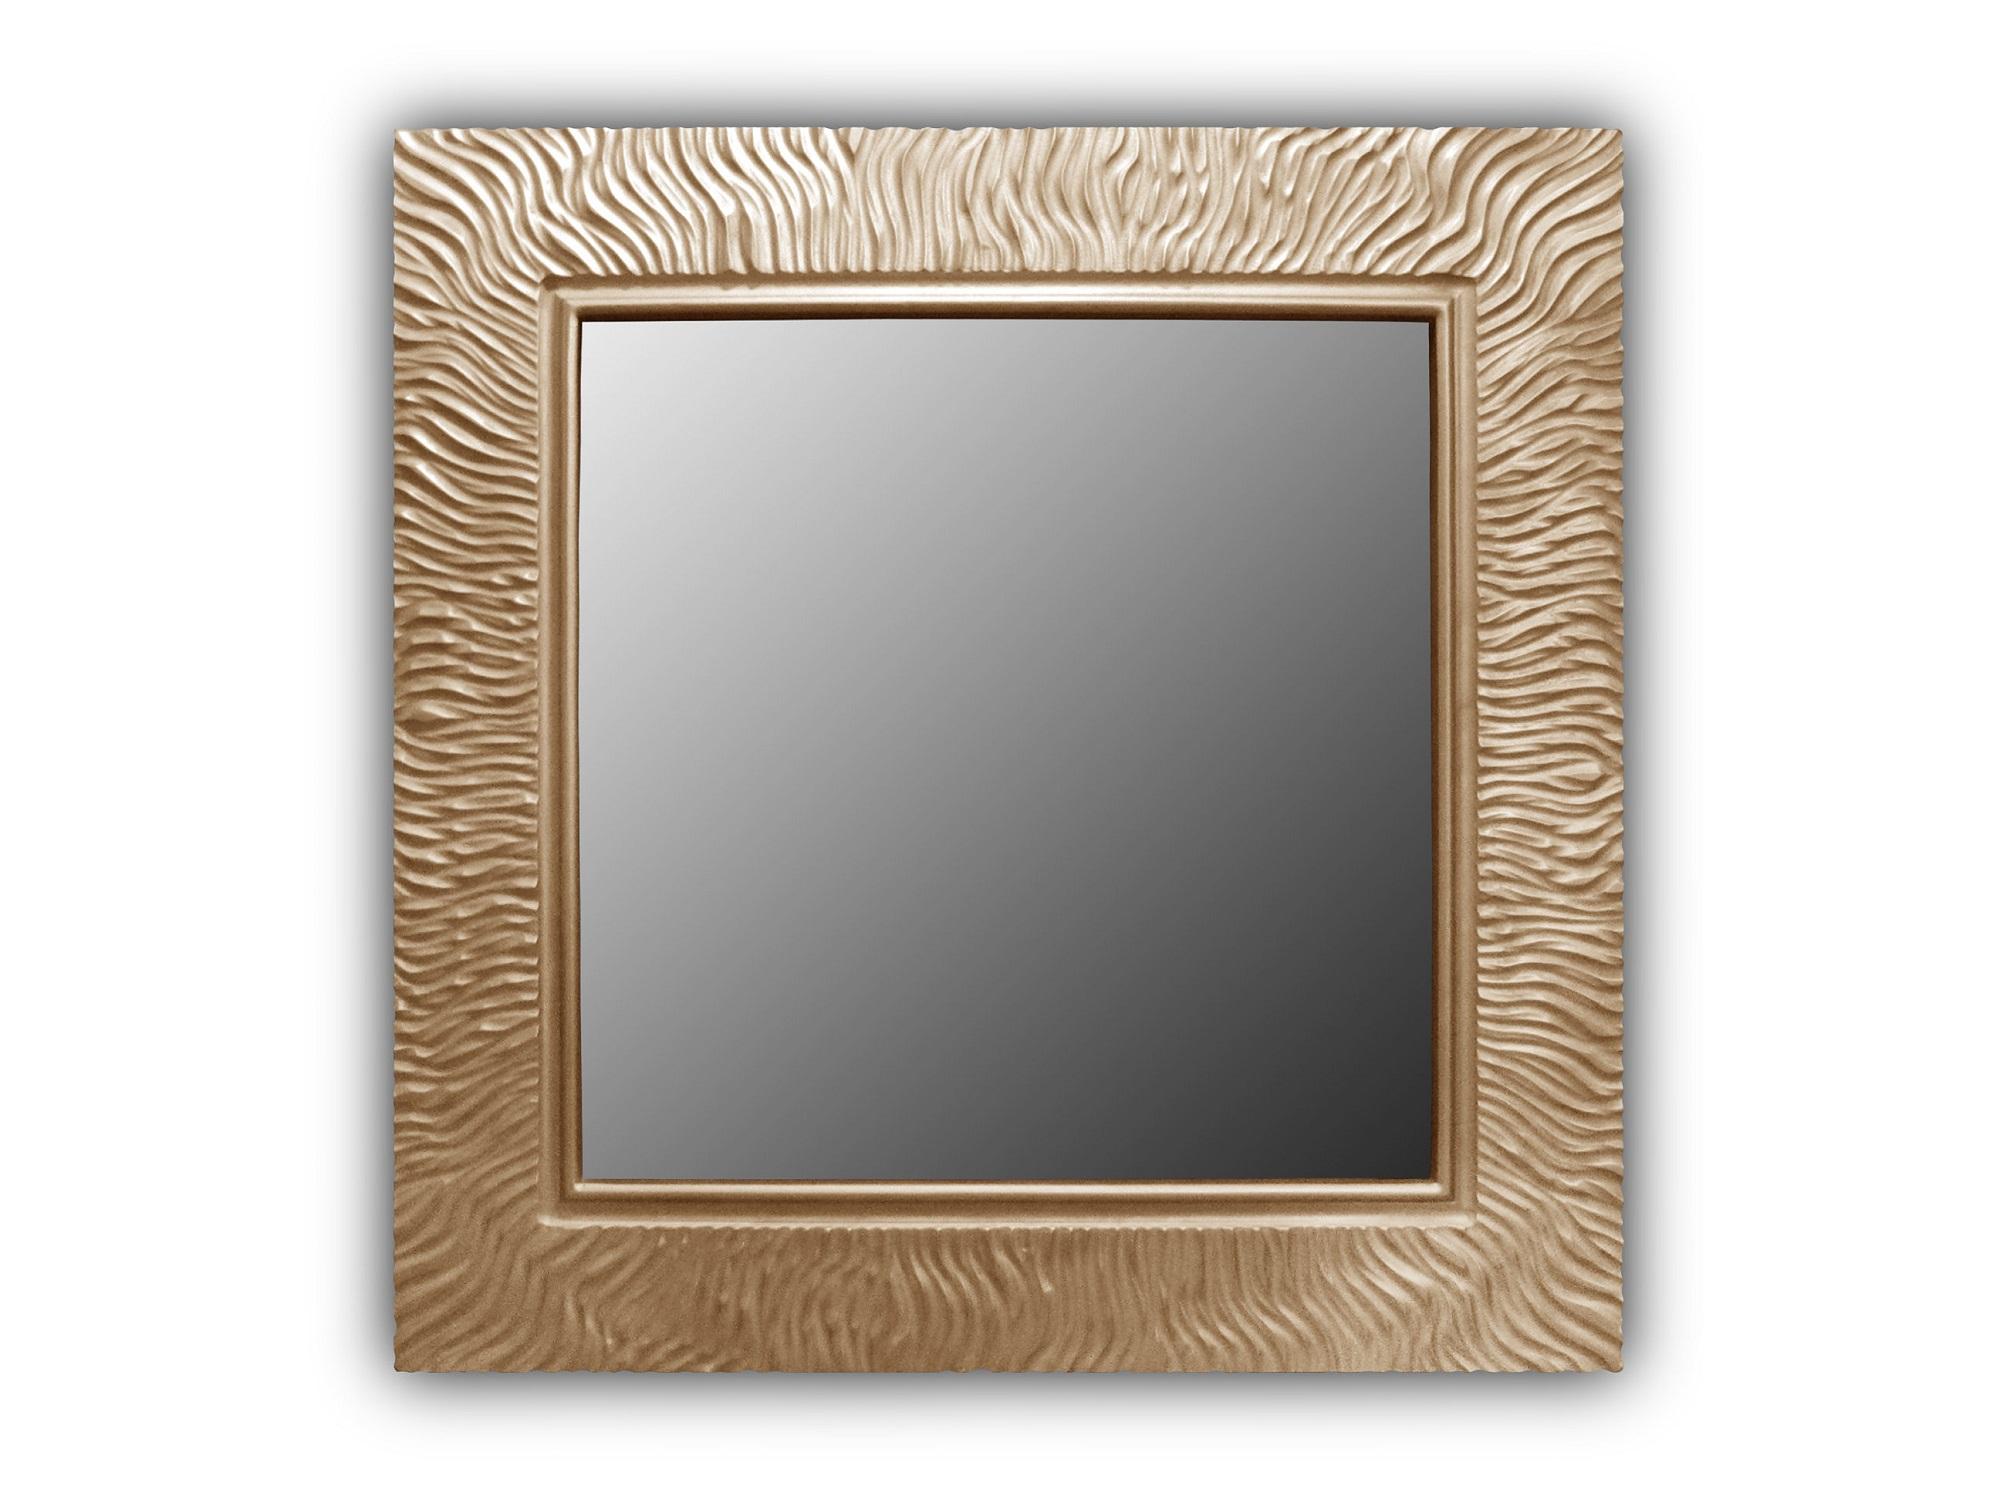 Зеркало Wave QuНастенные зеркала<br><br><br>Material: Дерево<br>Ширина см: 90.0<br>Высота см: 90.0<br>Глубина см: 3